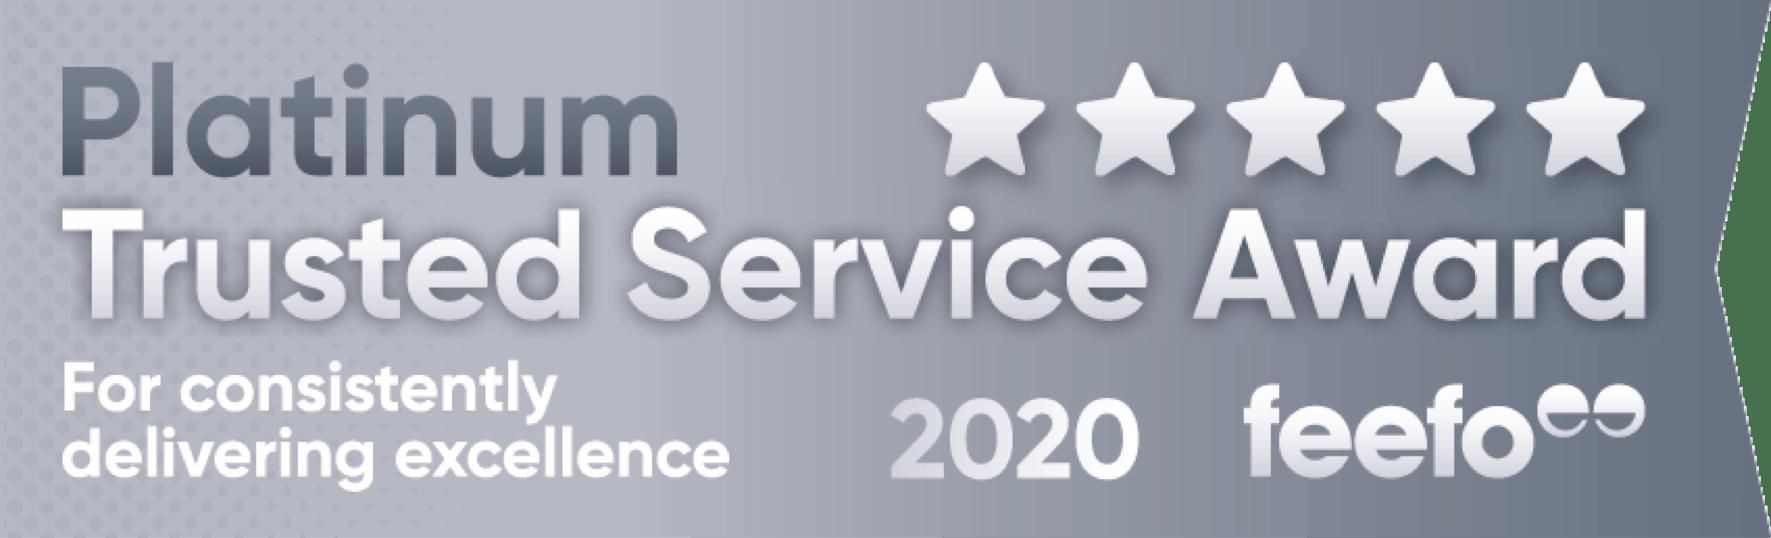 Platinum Trusted Service Award 2020 feefo award logo